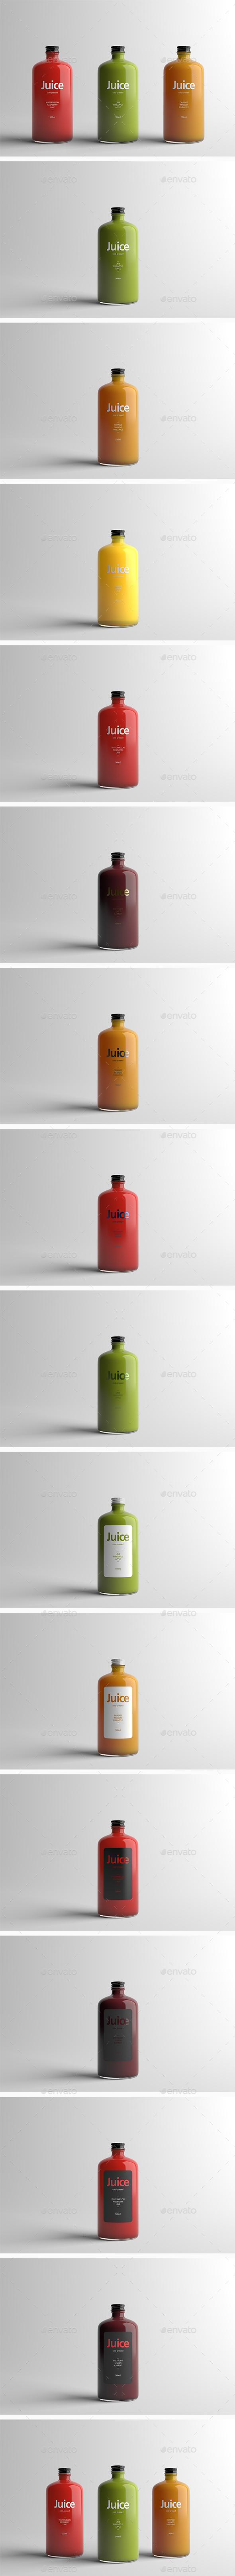 Juice Bottle Packaging Mock-Up - Food and Drink Packaging